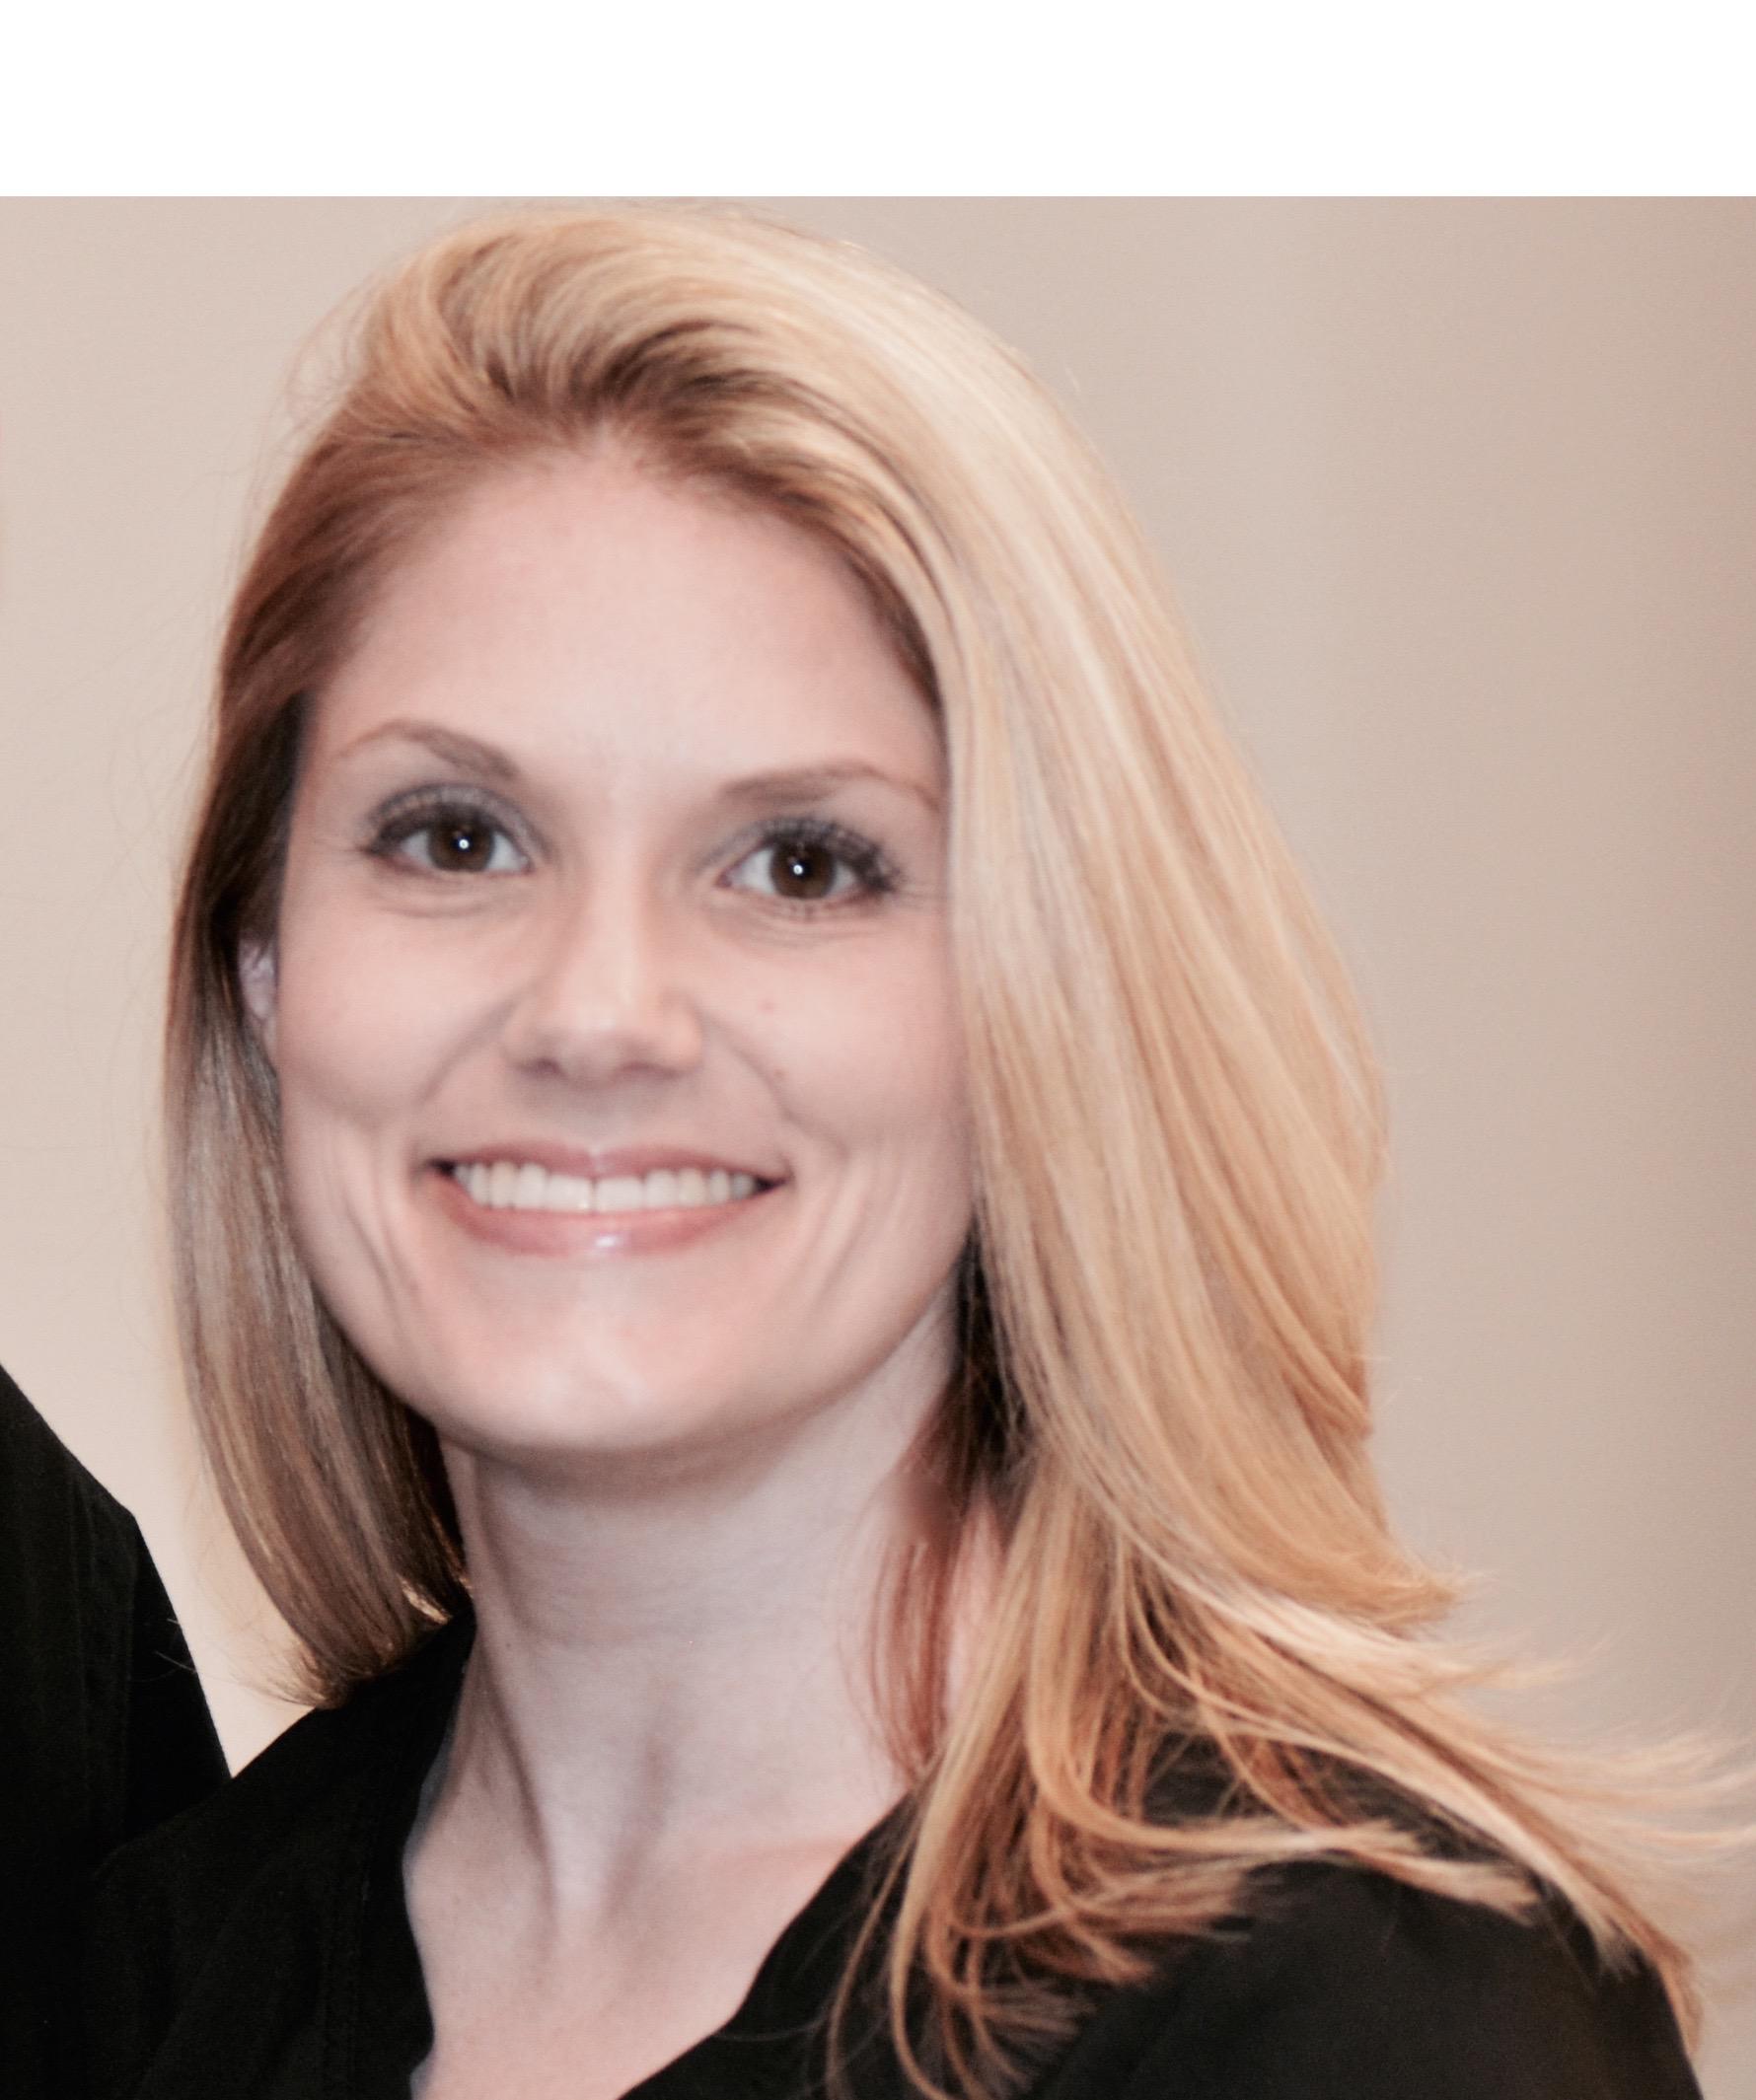 Dr. Andrea Fonner, Dentist Anesthesiologist